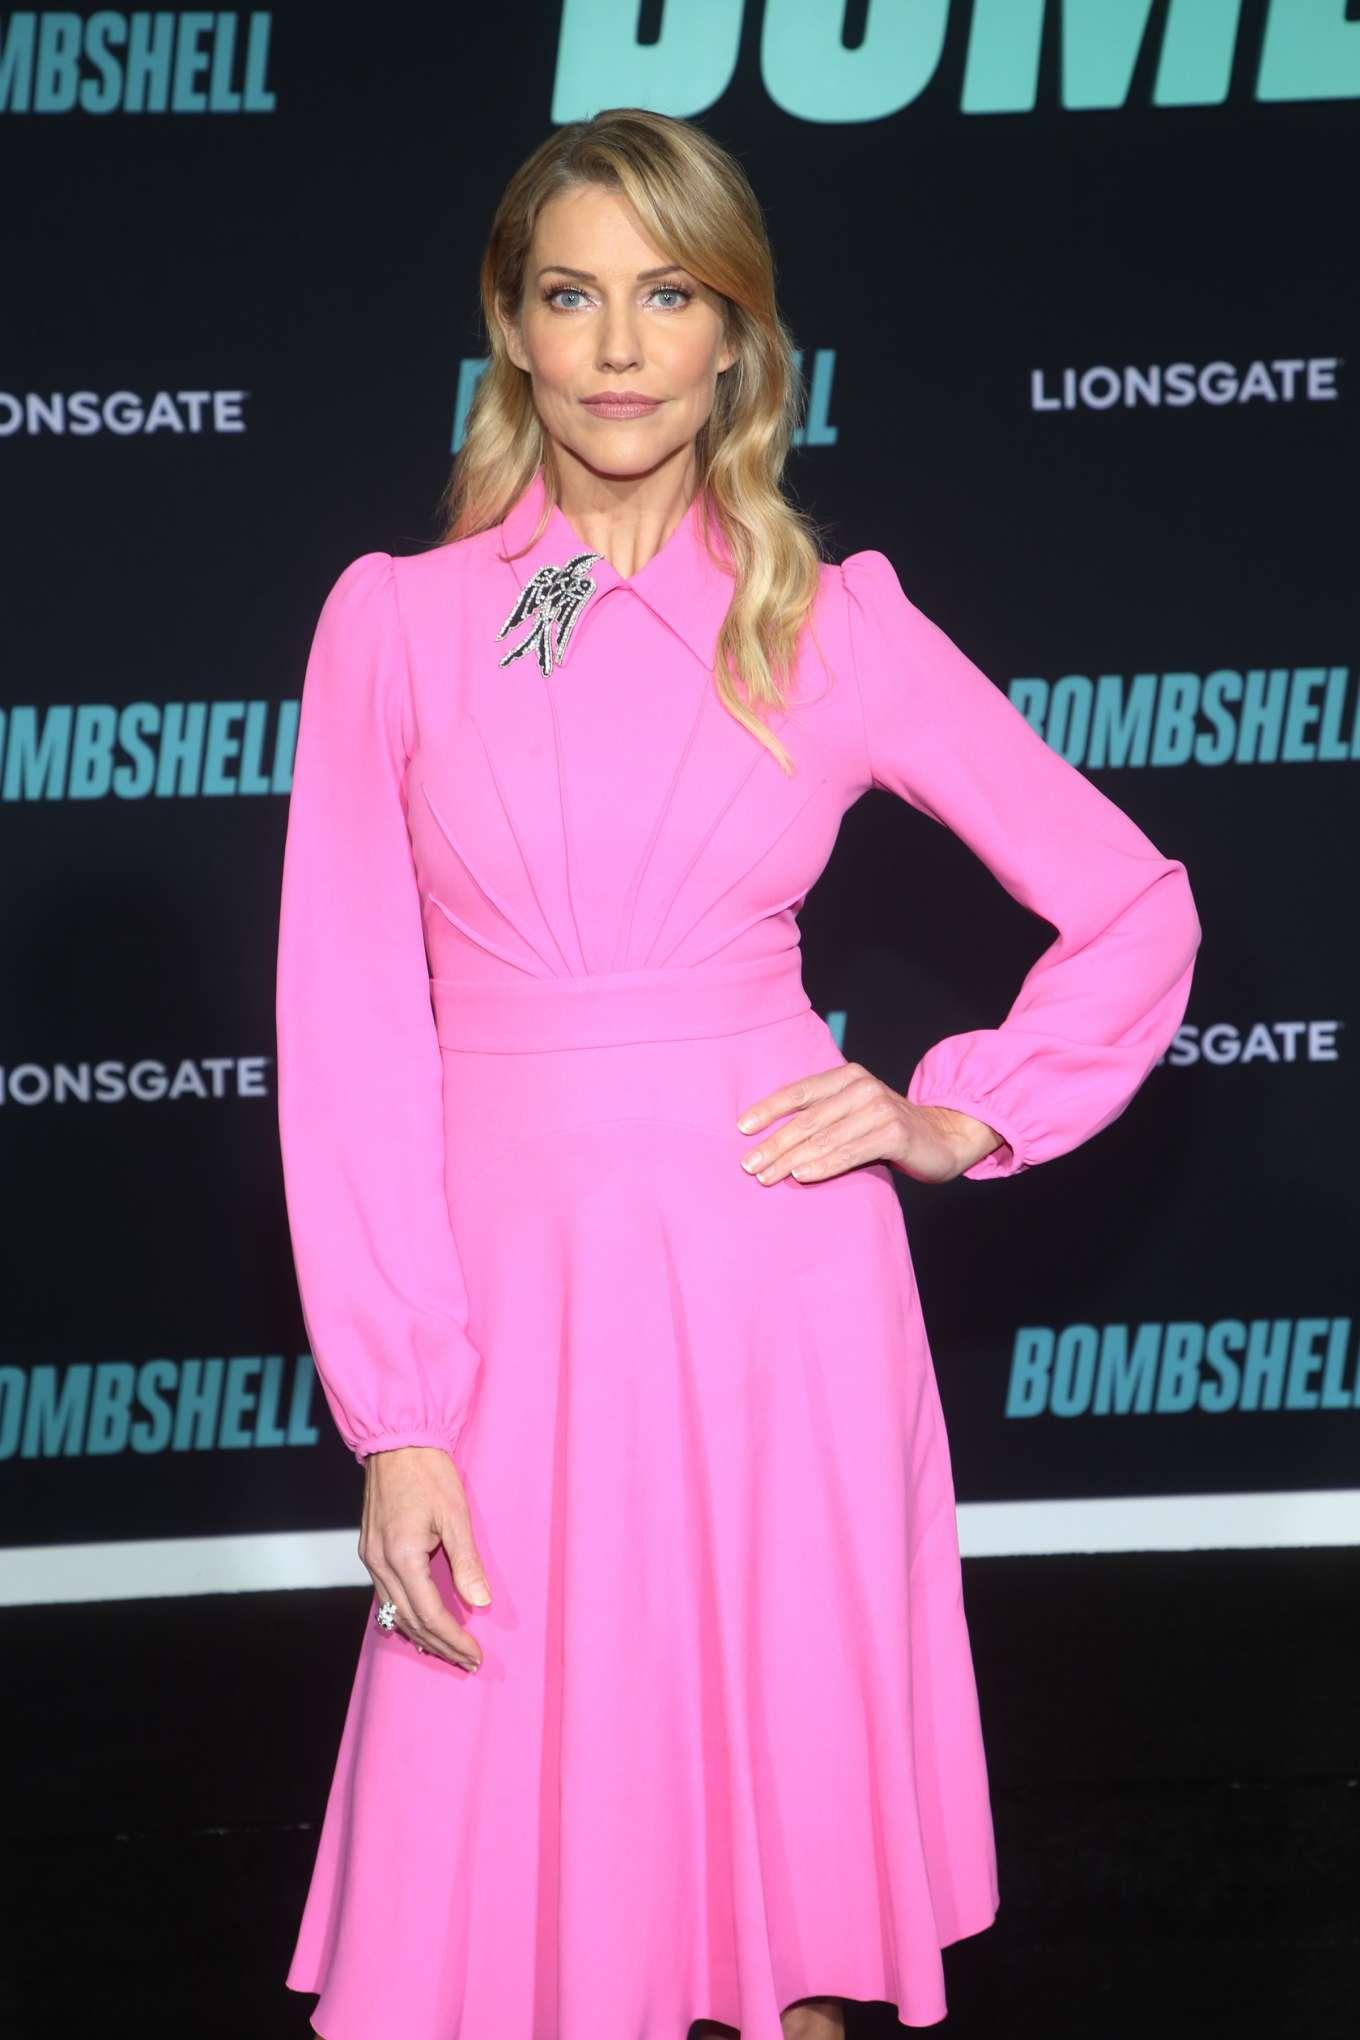 Tricia Helfer - 'Bombshell' Screening in Los Angeles